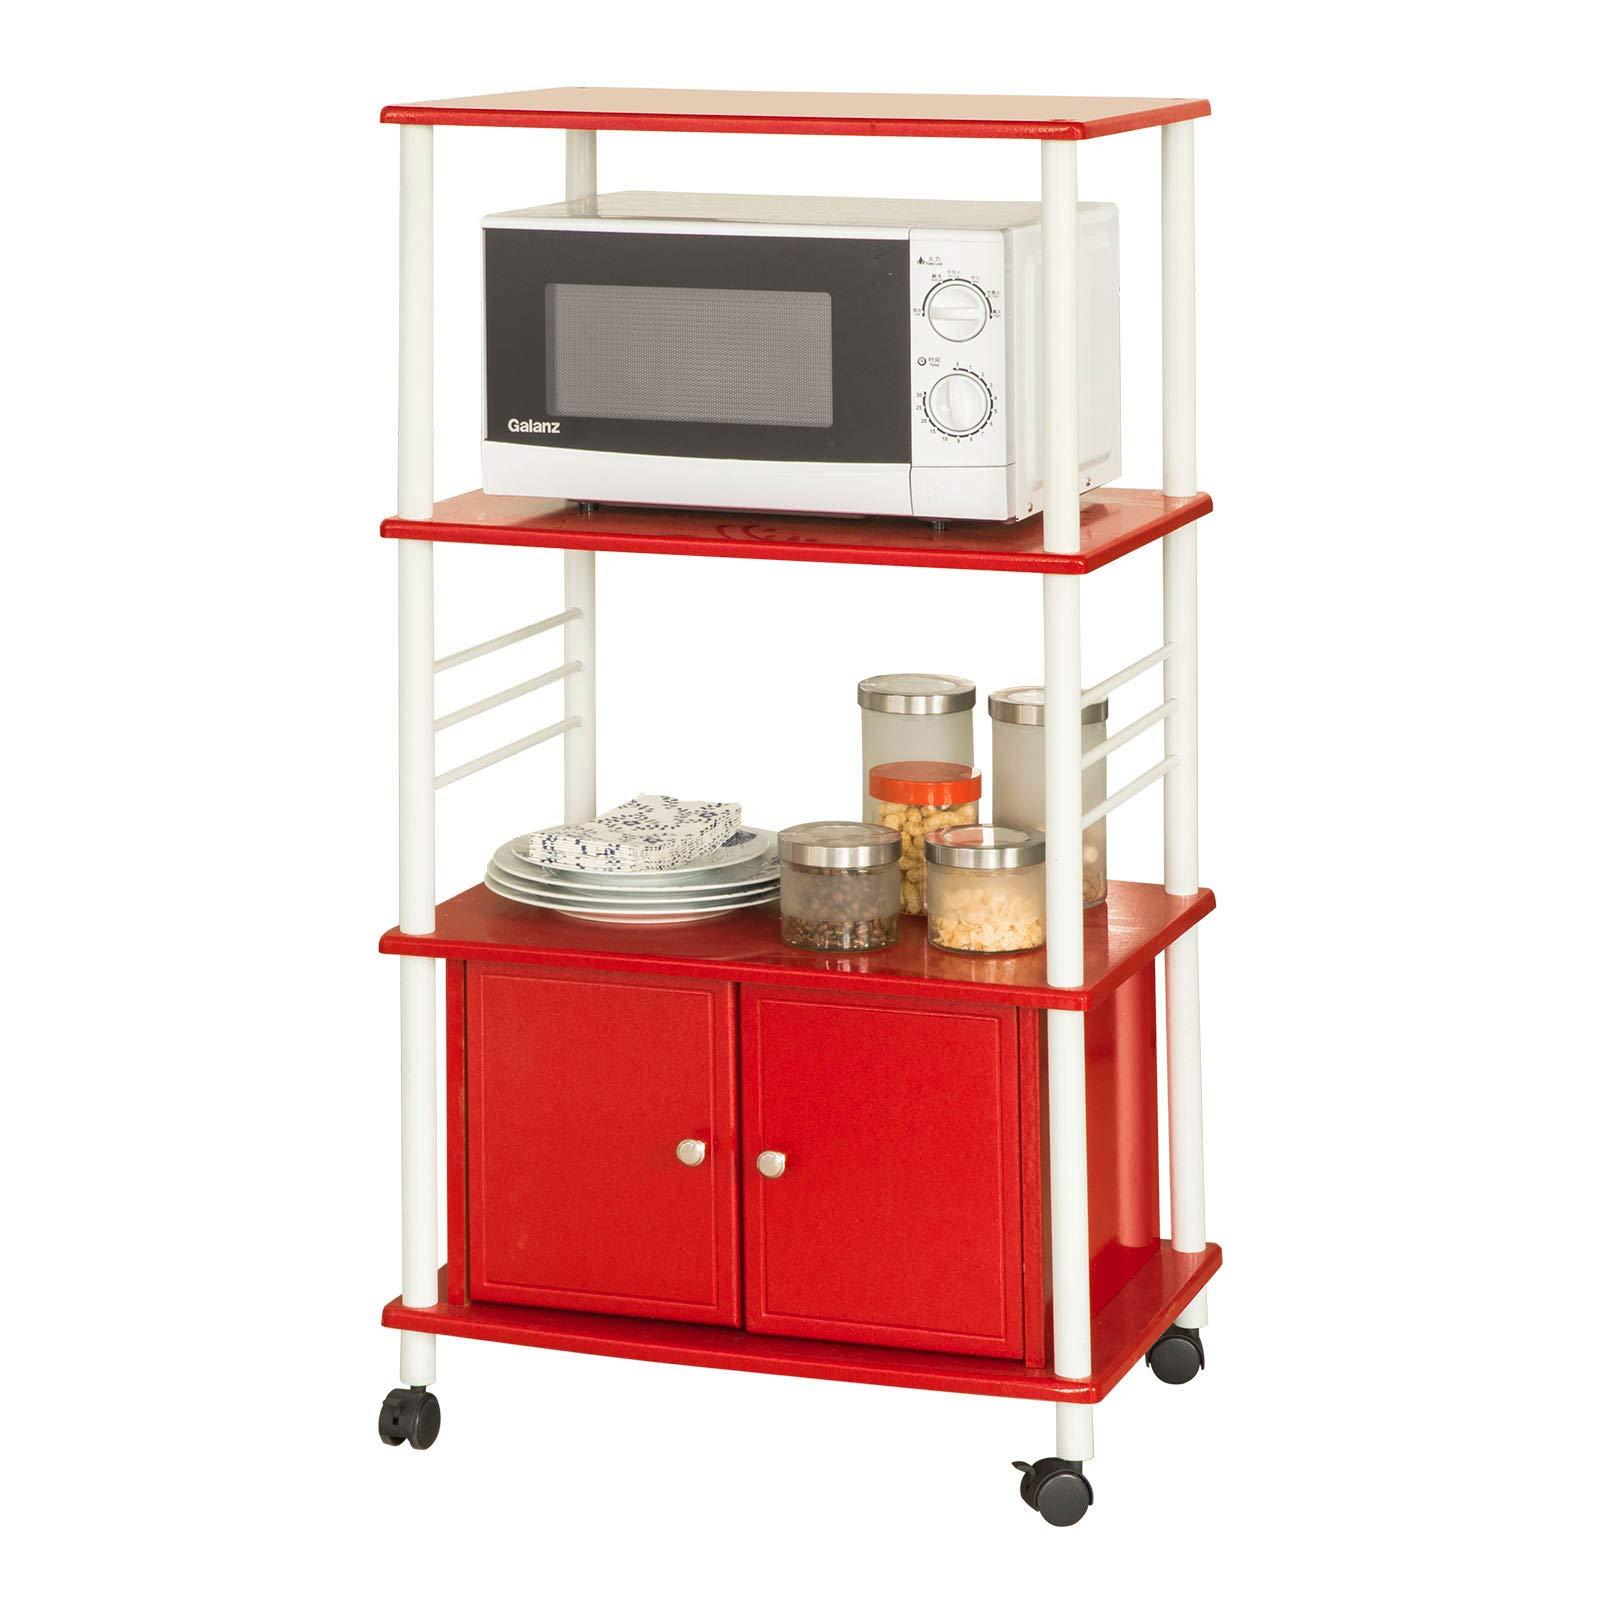 SoBuy® Carrito de cocina, estante de cocina, estante con ruedas, estantería de